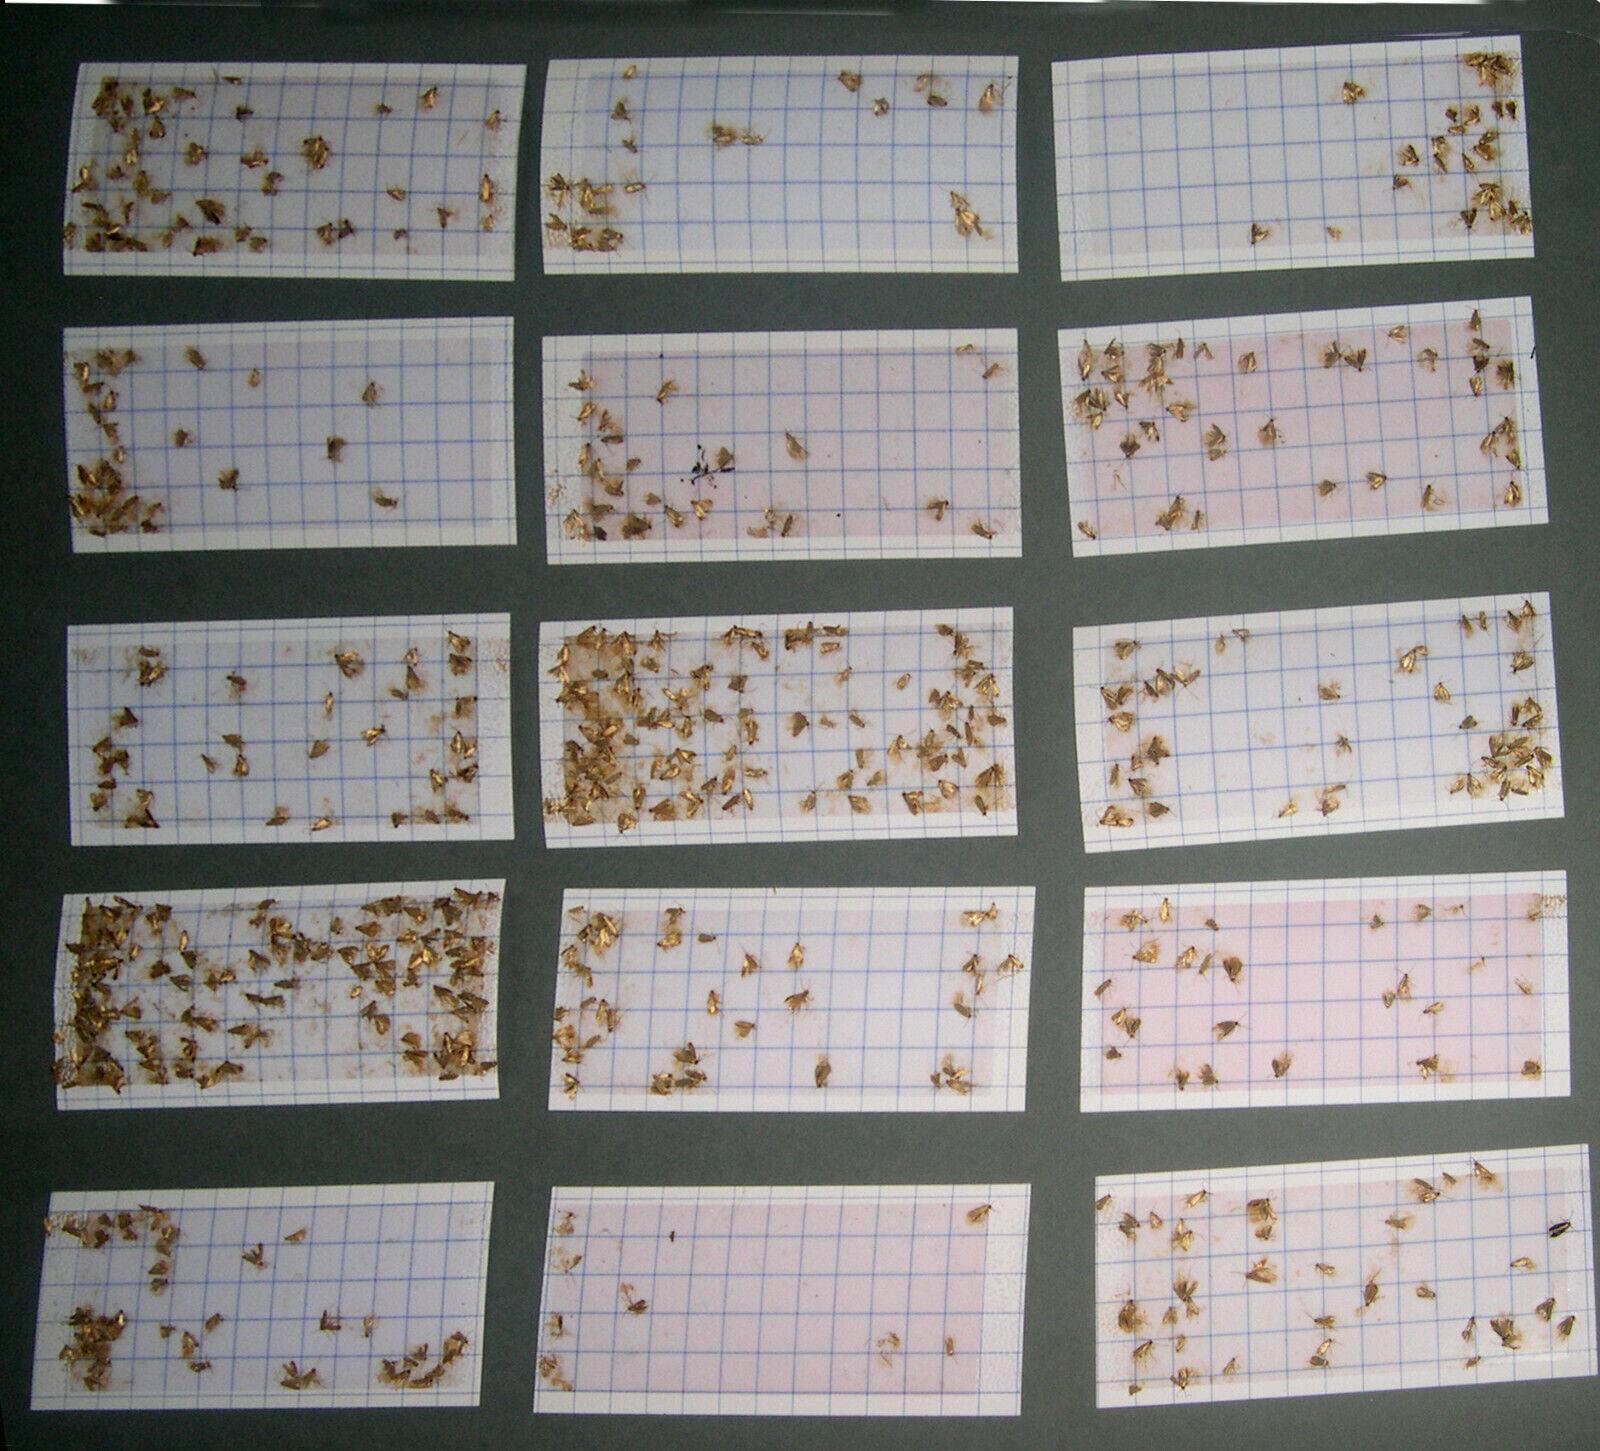 10 x DIAMOND CLOTHES MOTH TRAP PHEROMONE REFILLS- USE By APRIL 2025